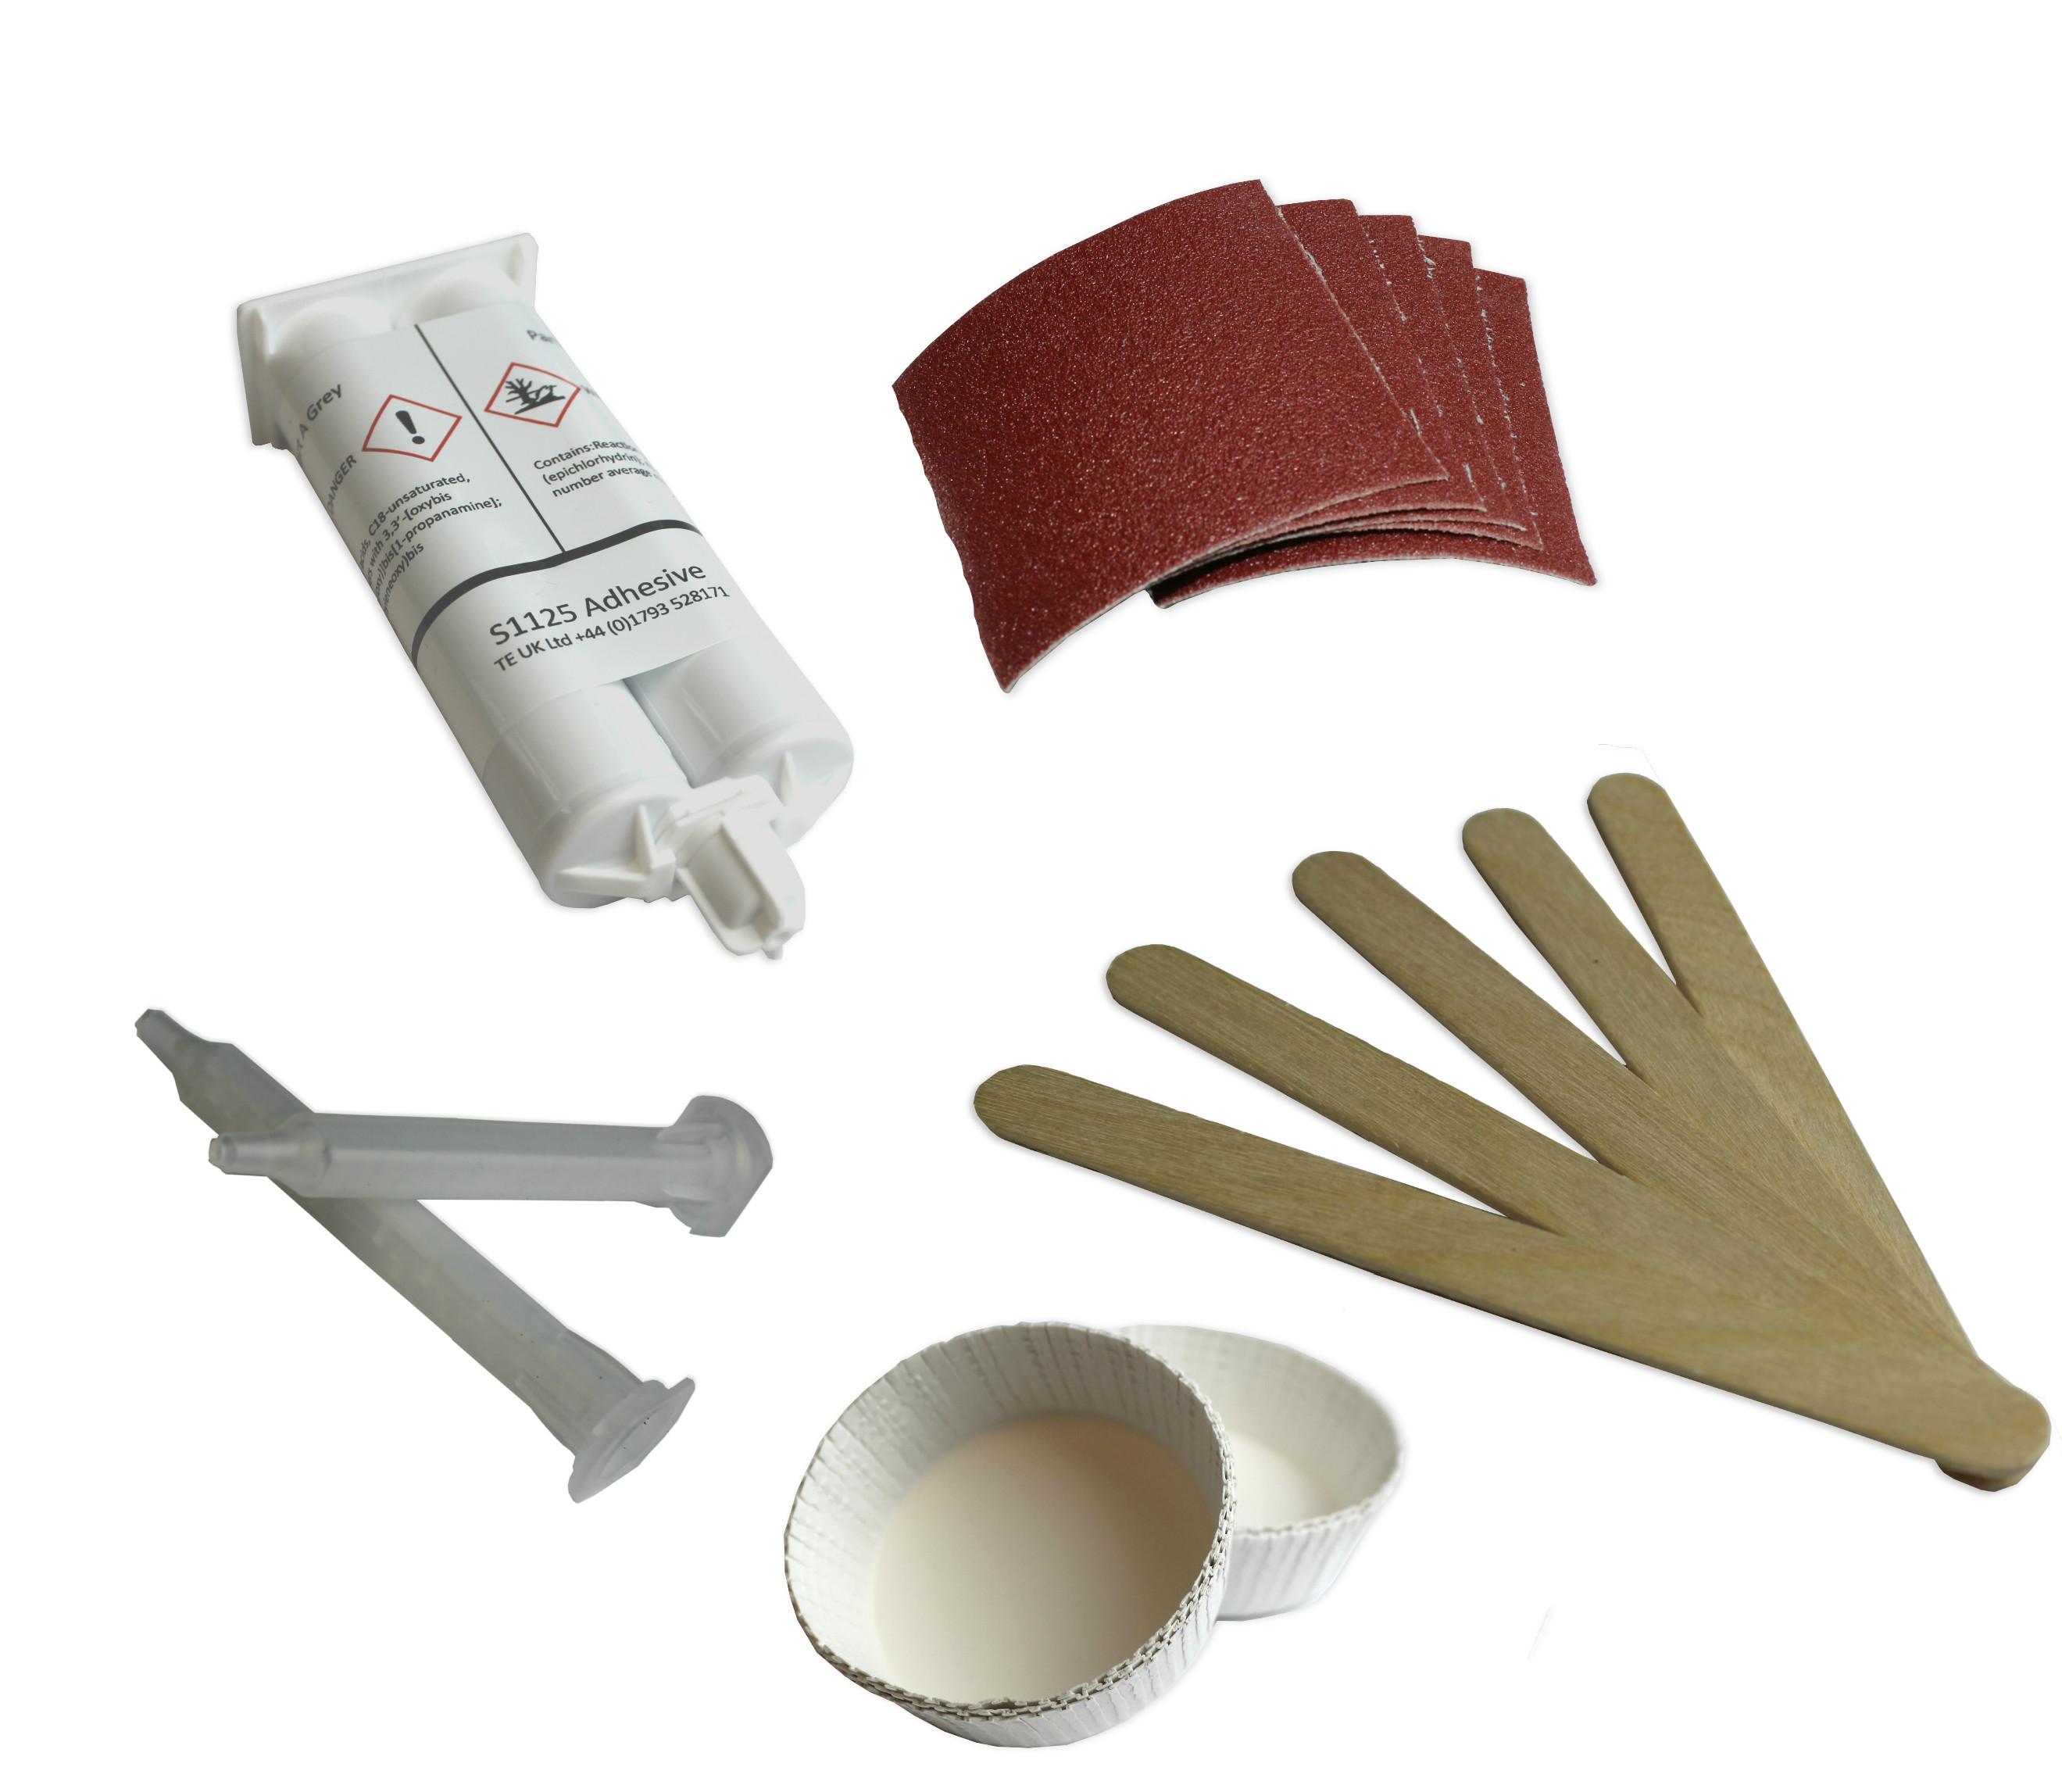 Epoxy adhesive kit